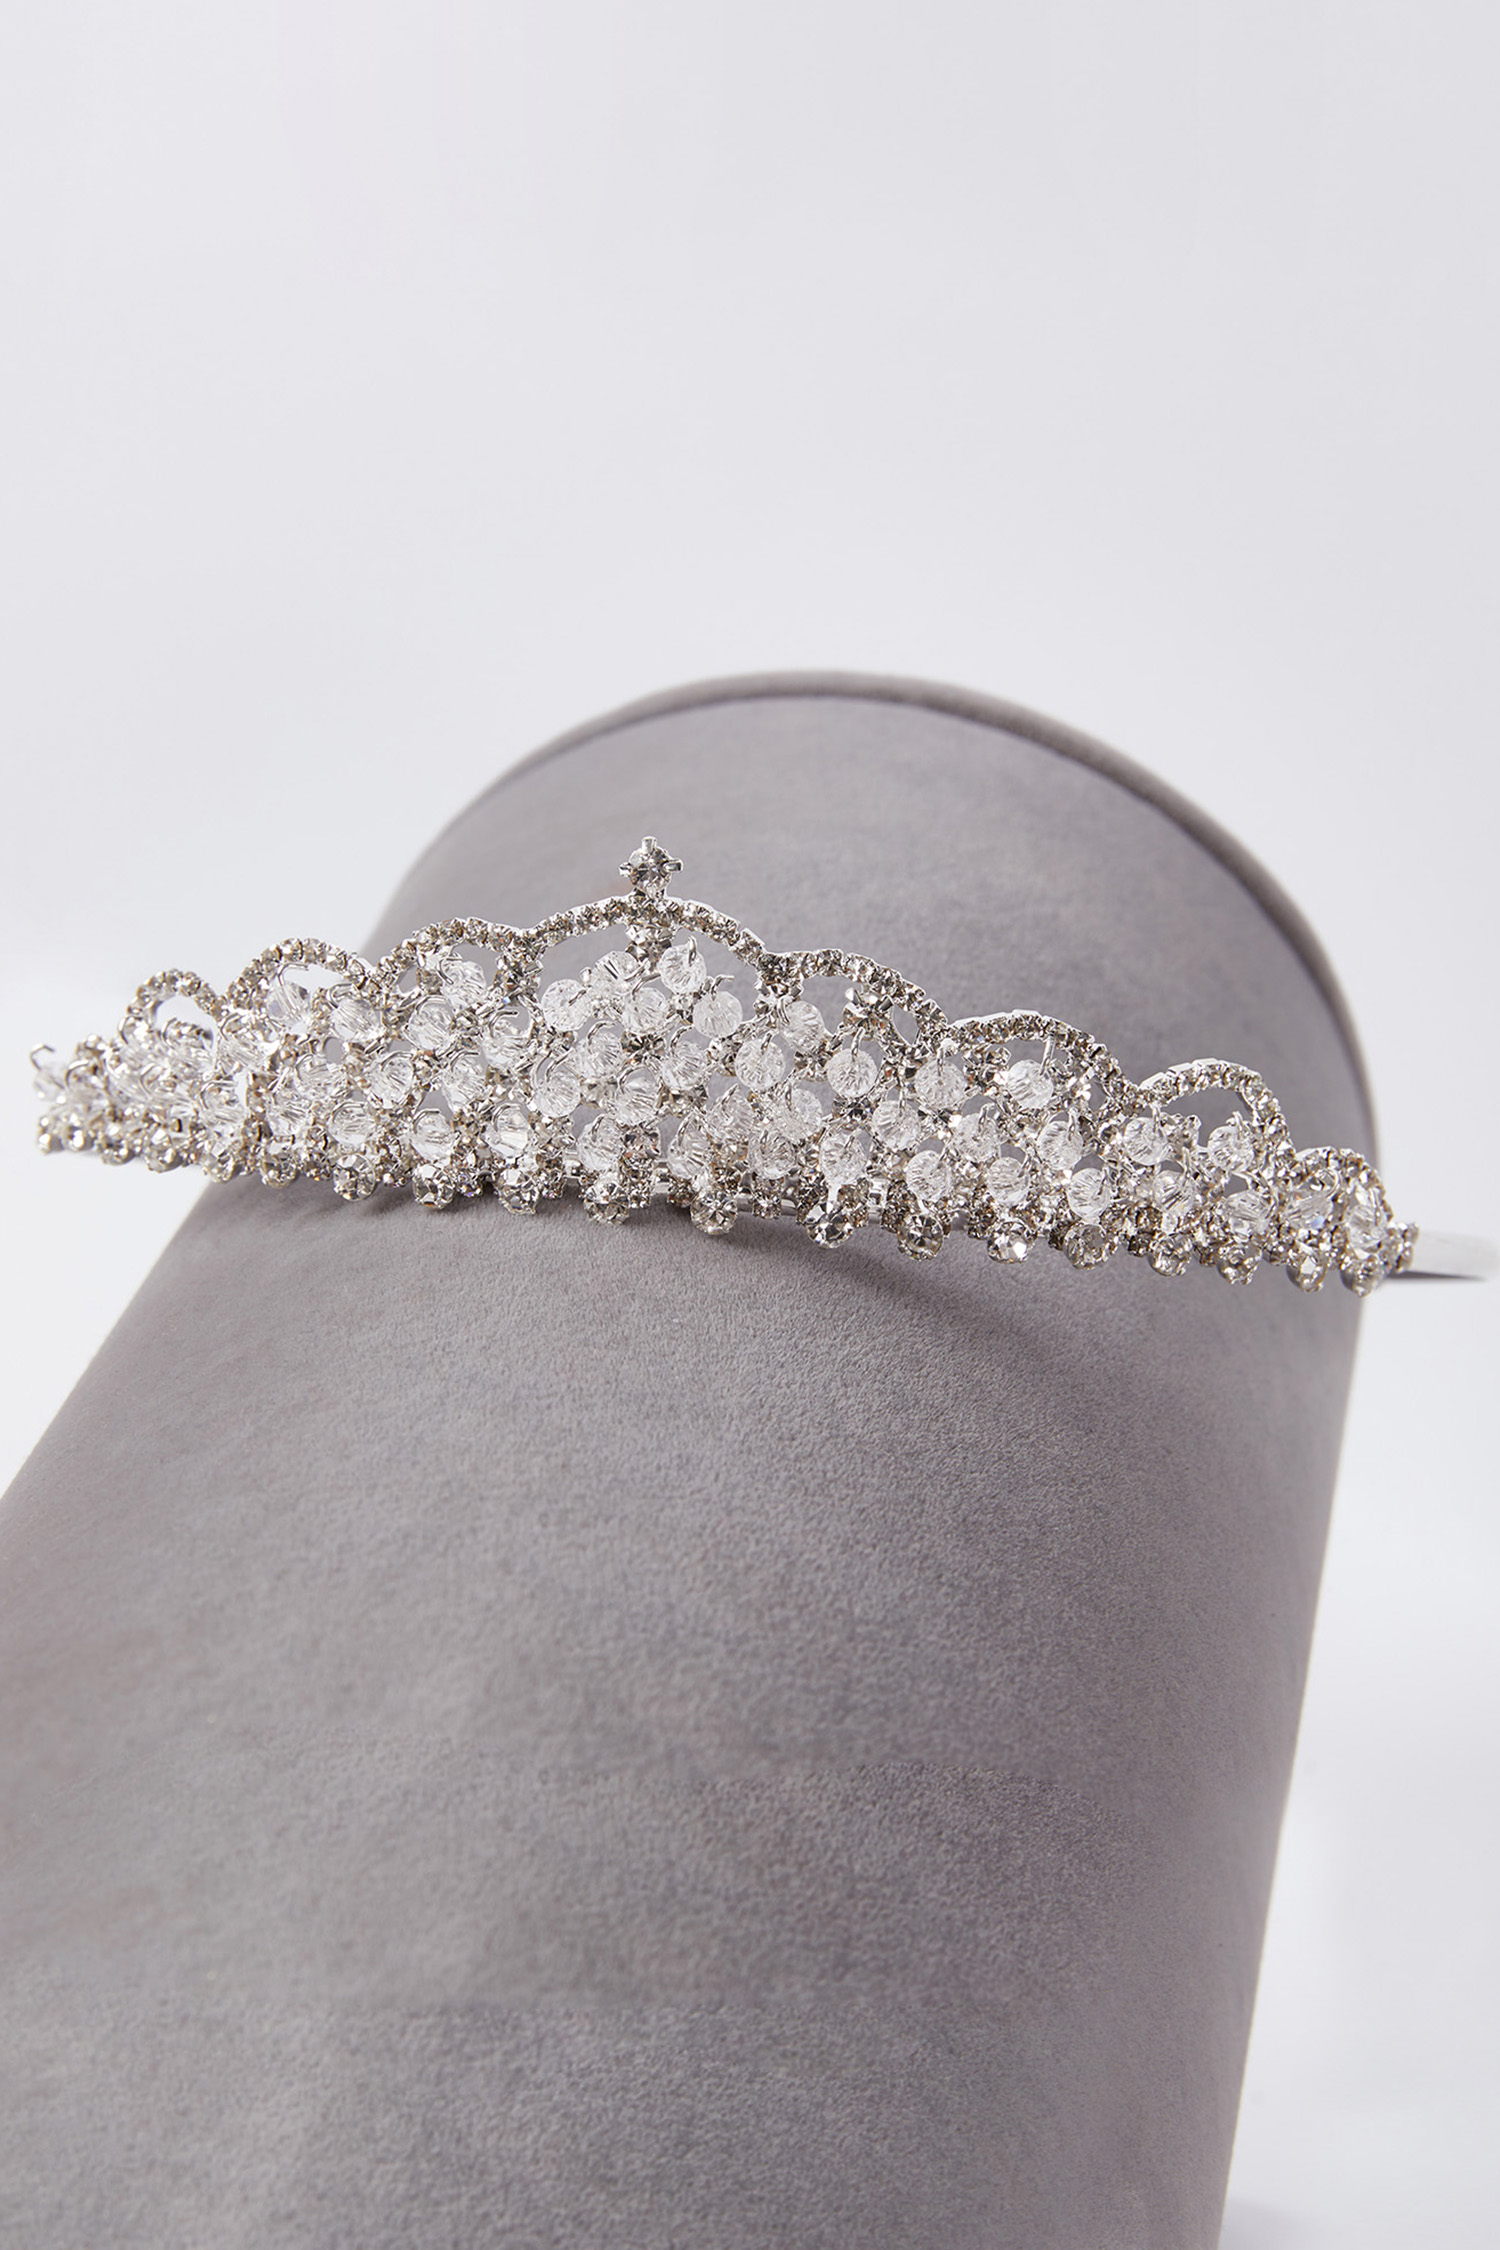 Gümüş Rengi Prenses Model Parlak Gelin Tacı - Thumbnail